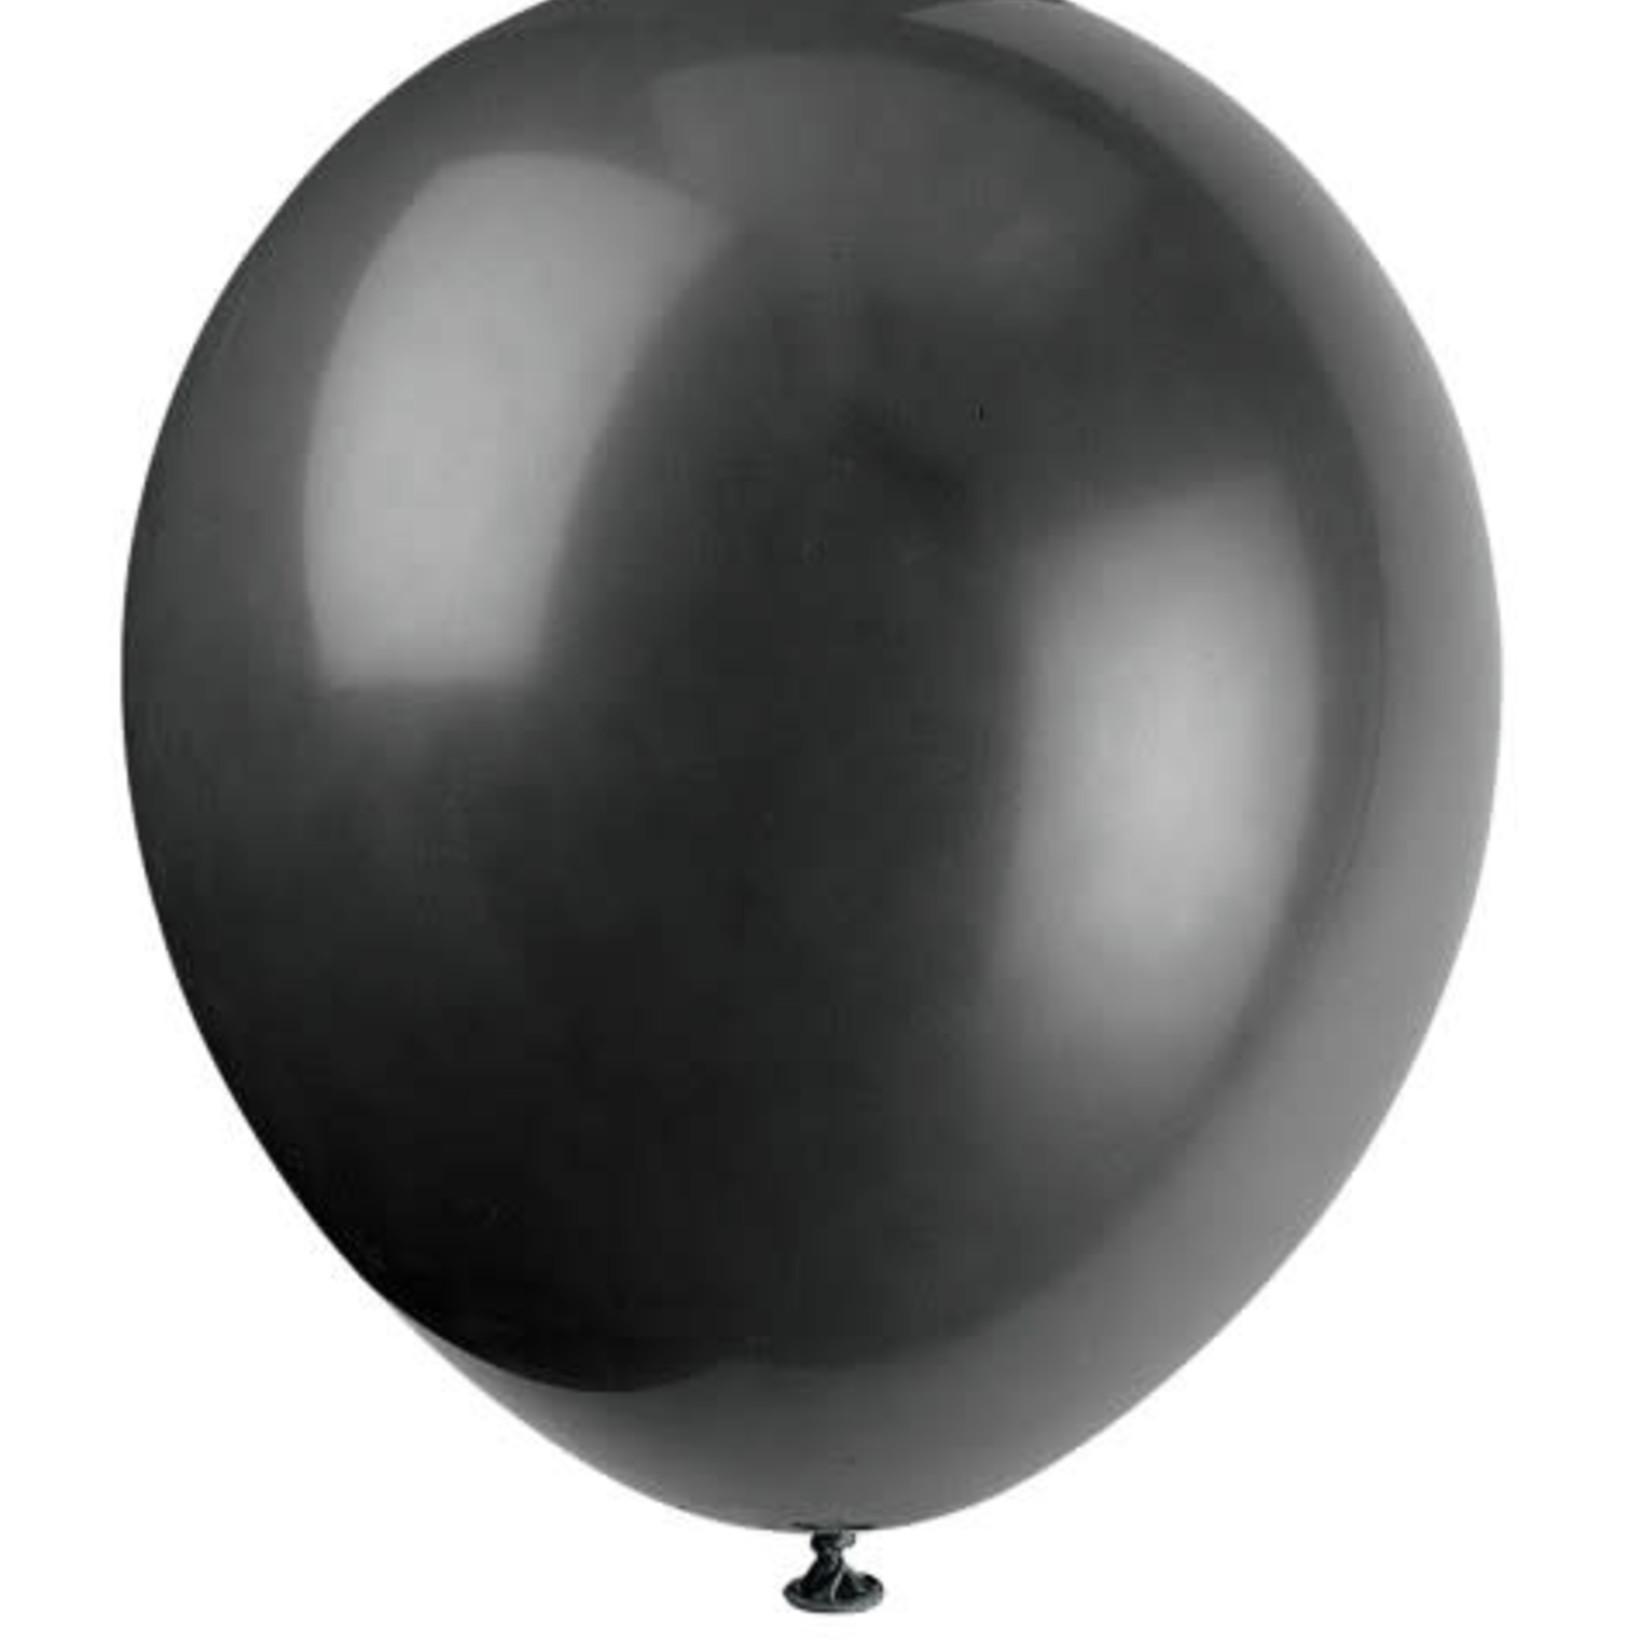 10 12'' JET BLACK BALLOONS